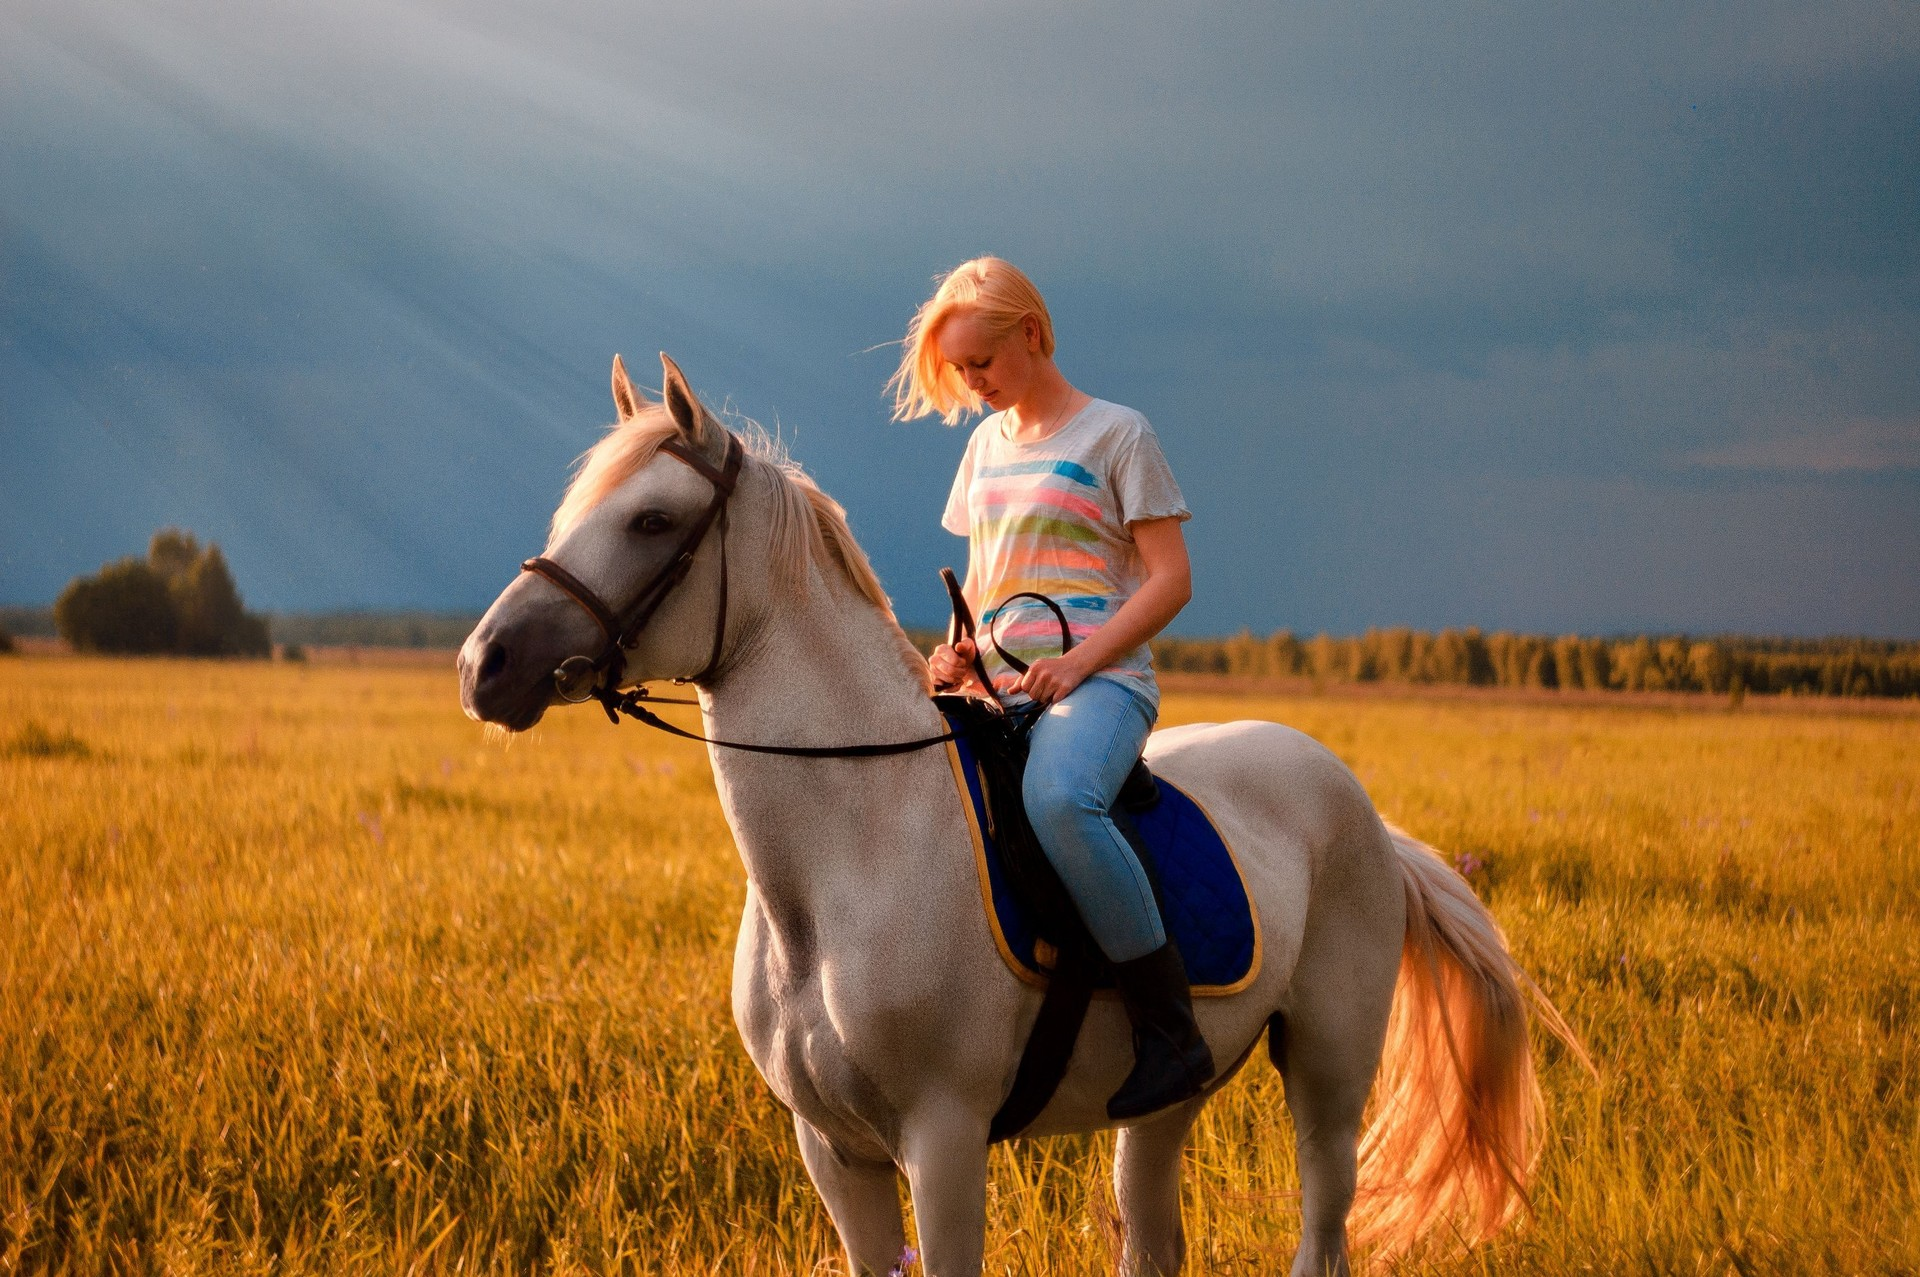 Seorang sukarelawan naik kuda di klub wisata kuda Verkhom po Meshere.